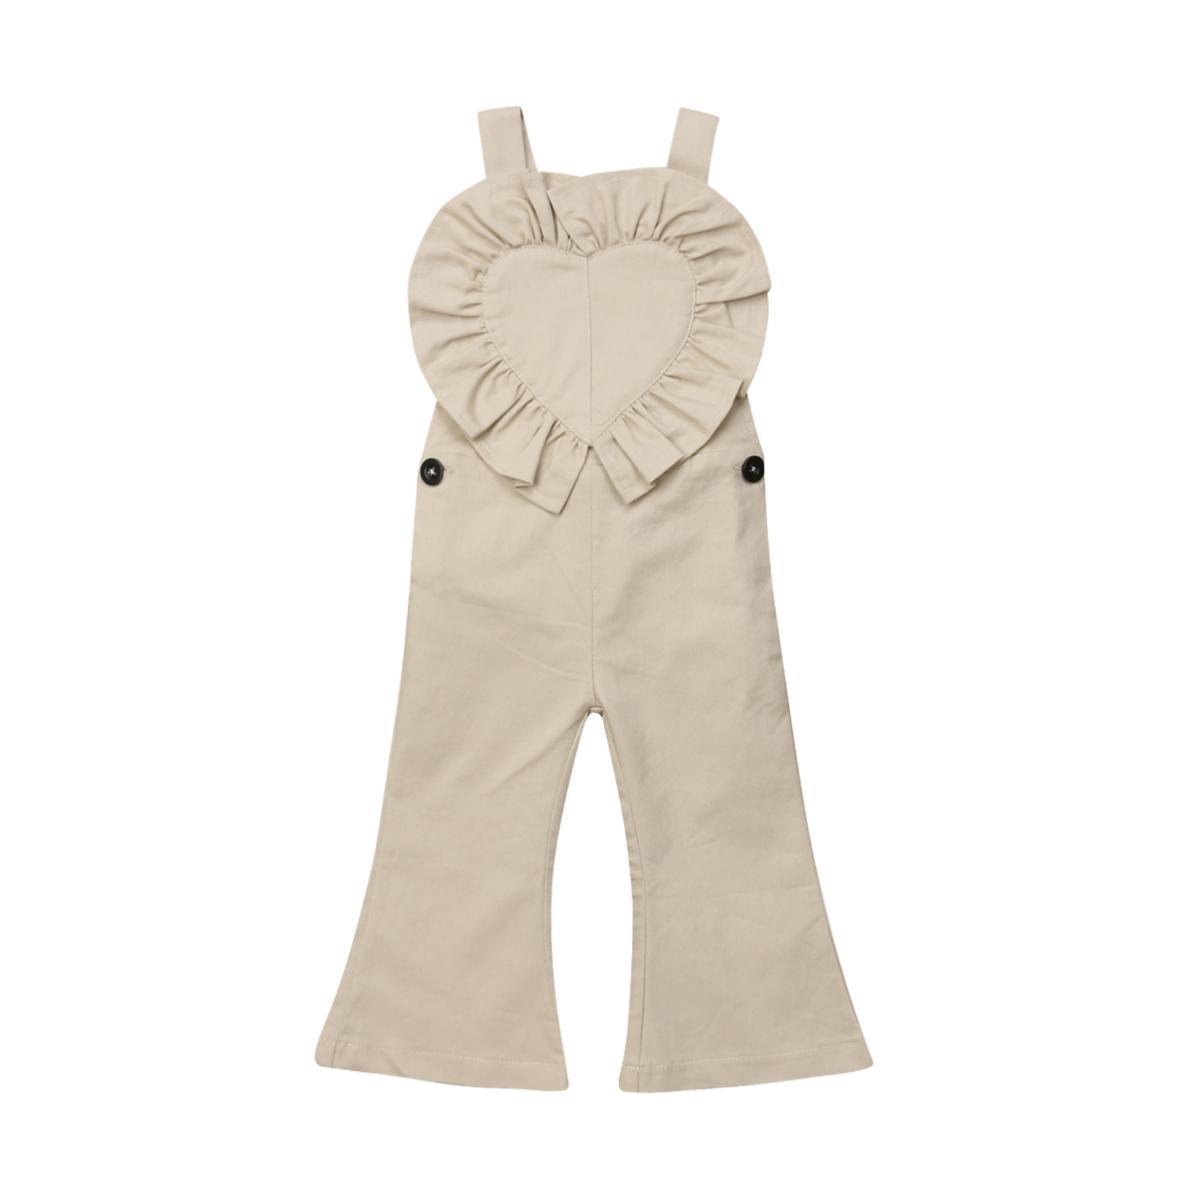 Sameno Baby Winter Clothes Set,4PCS Toddler Baby Boy Cartoon Letter Romper Pants Hat Headbands Outfit Set